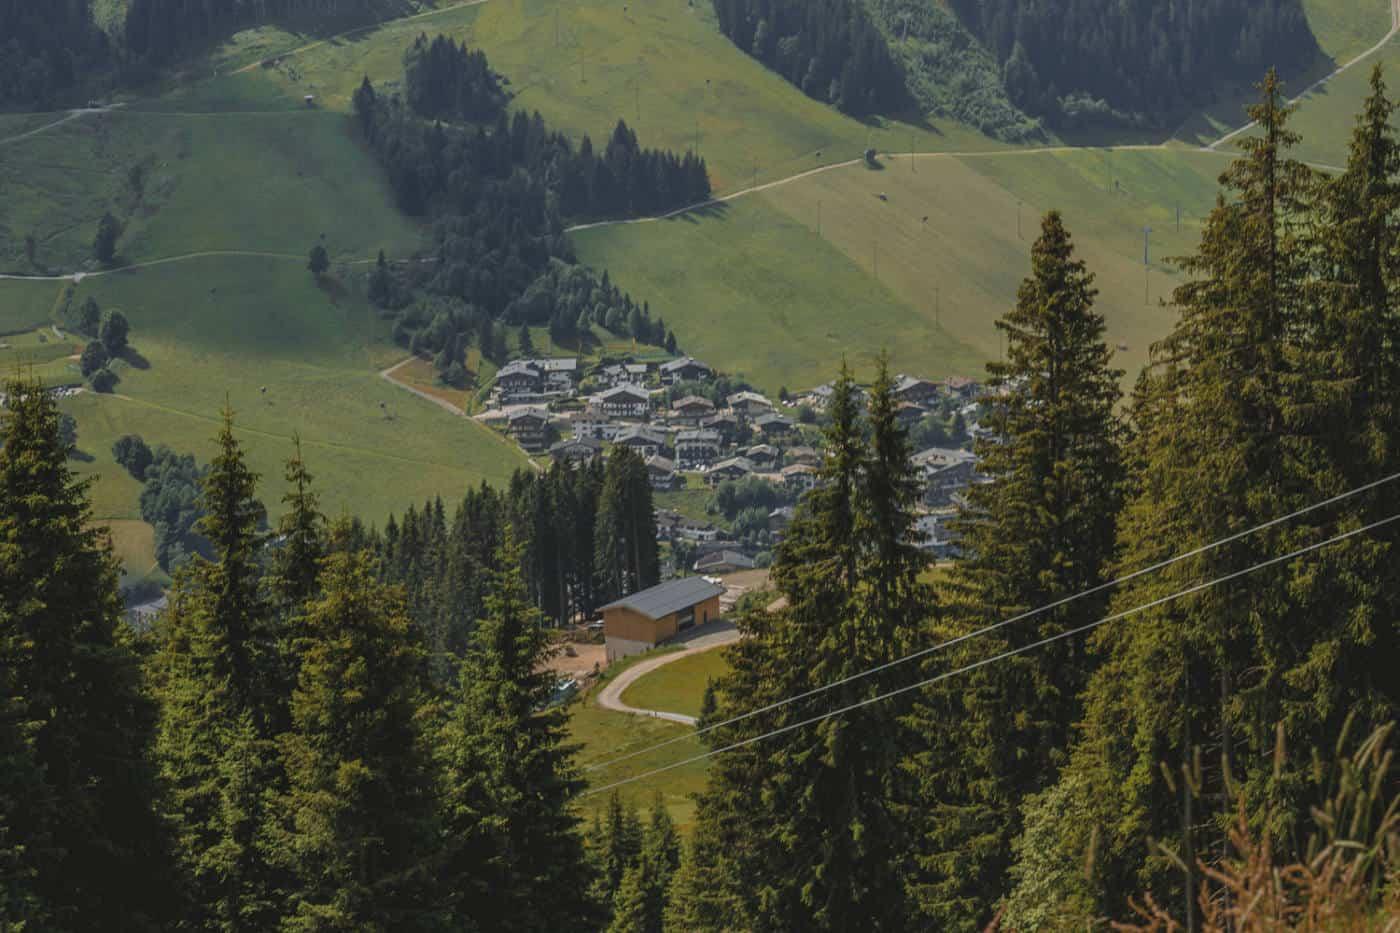 Saalbach-Hinterglemm in Austria